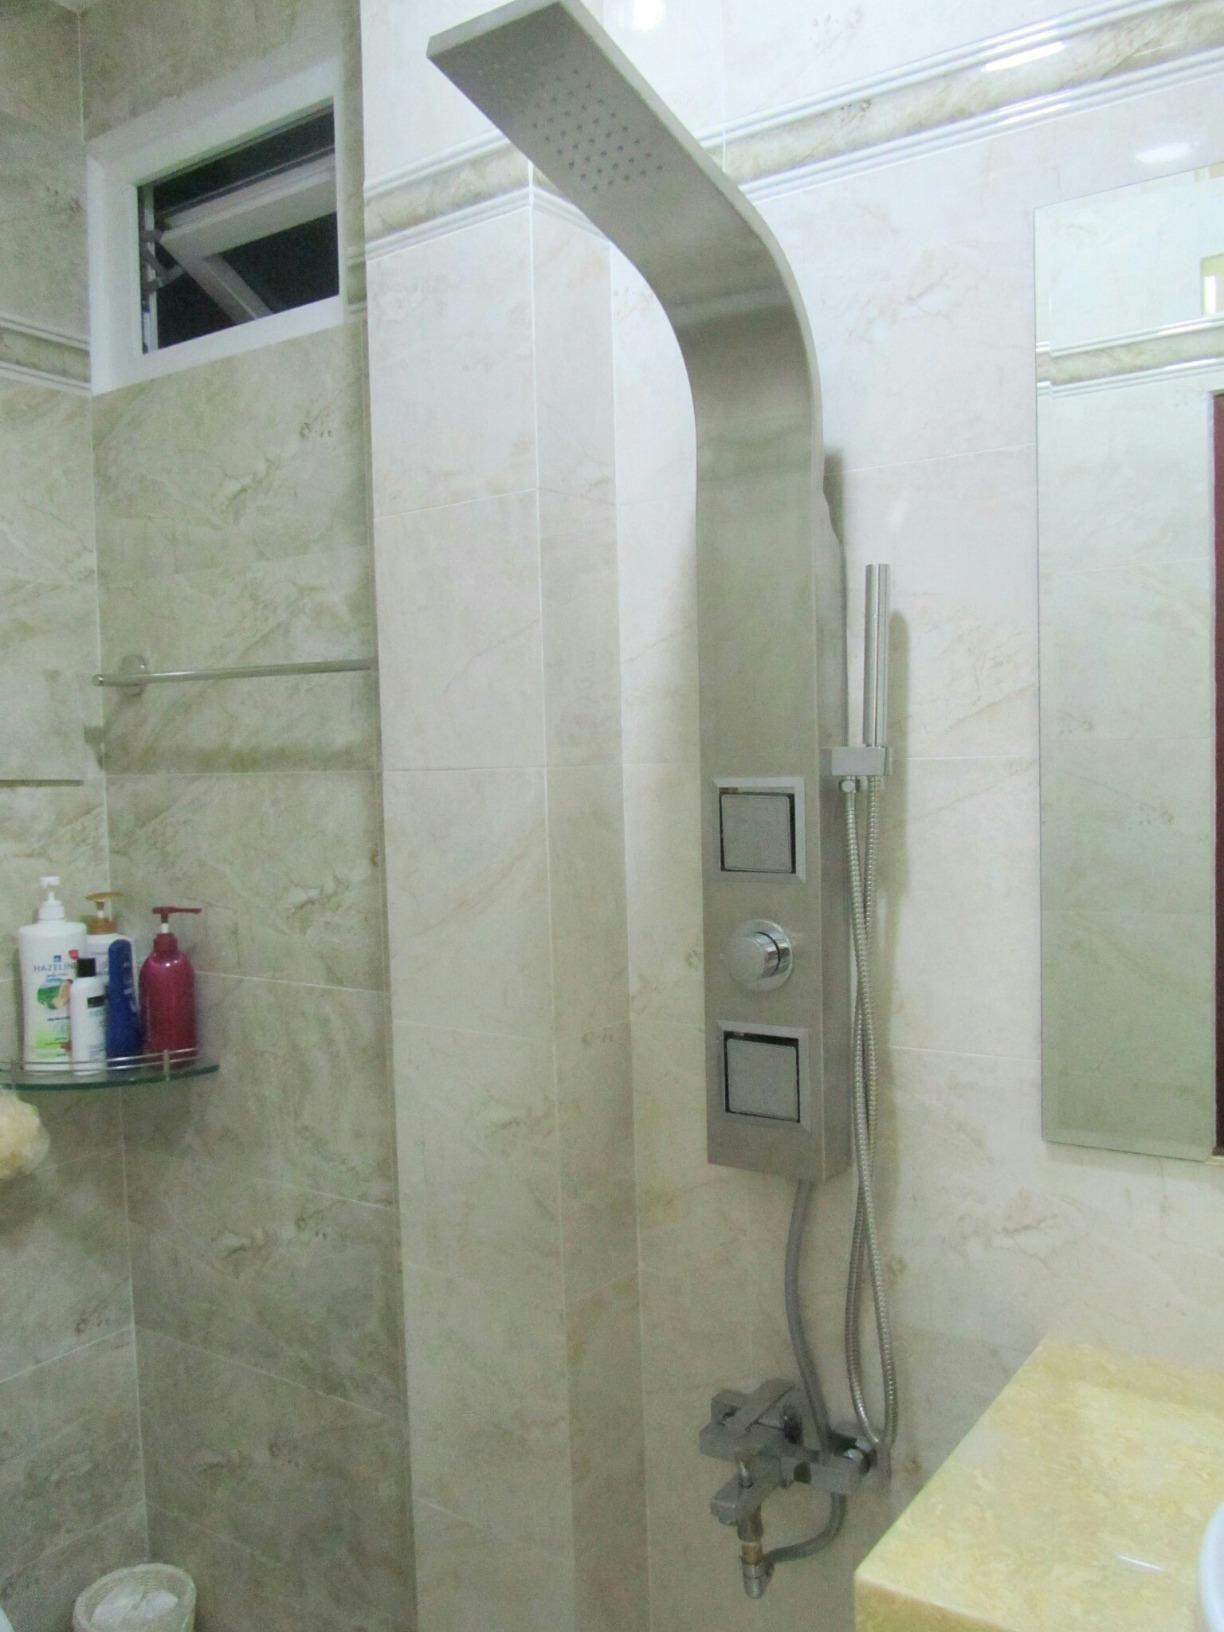 the akdy az9000 shower panel provides a spalike